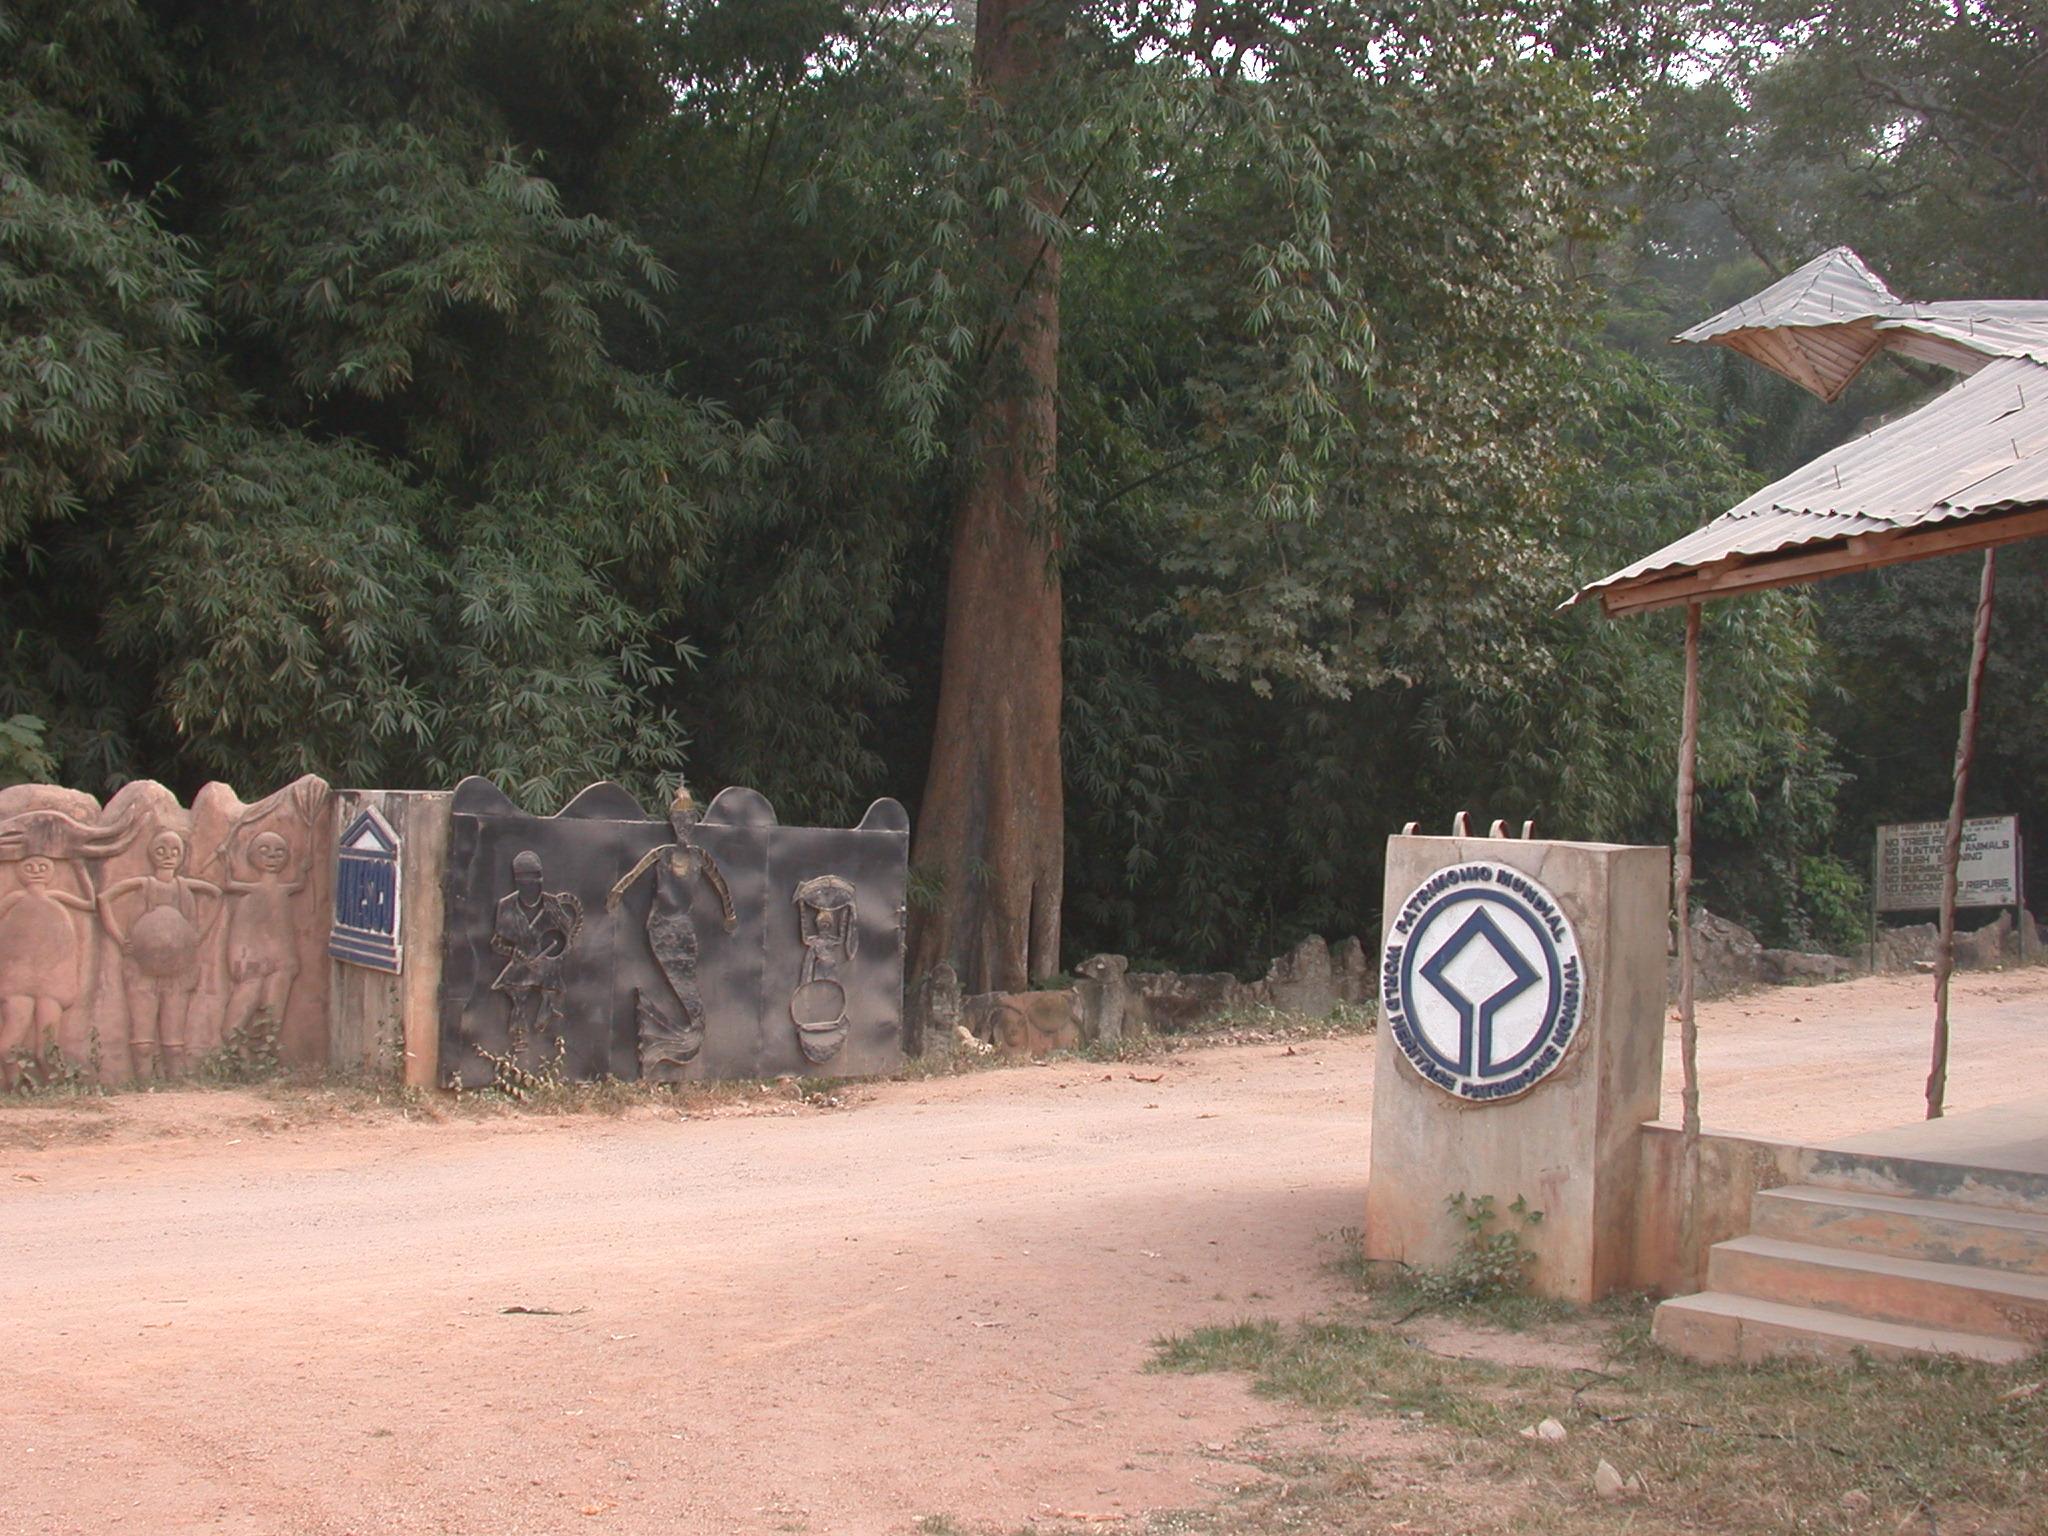 Entrance to Osun Sacred Grove, Oshogbo, Nigeria